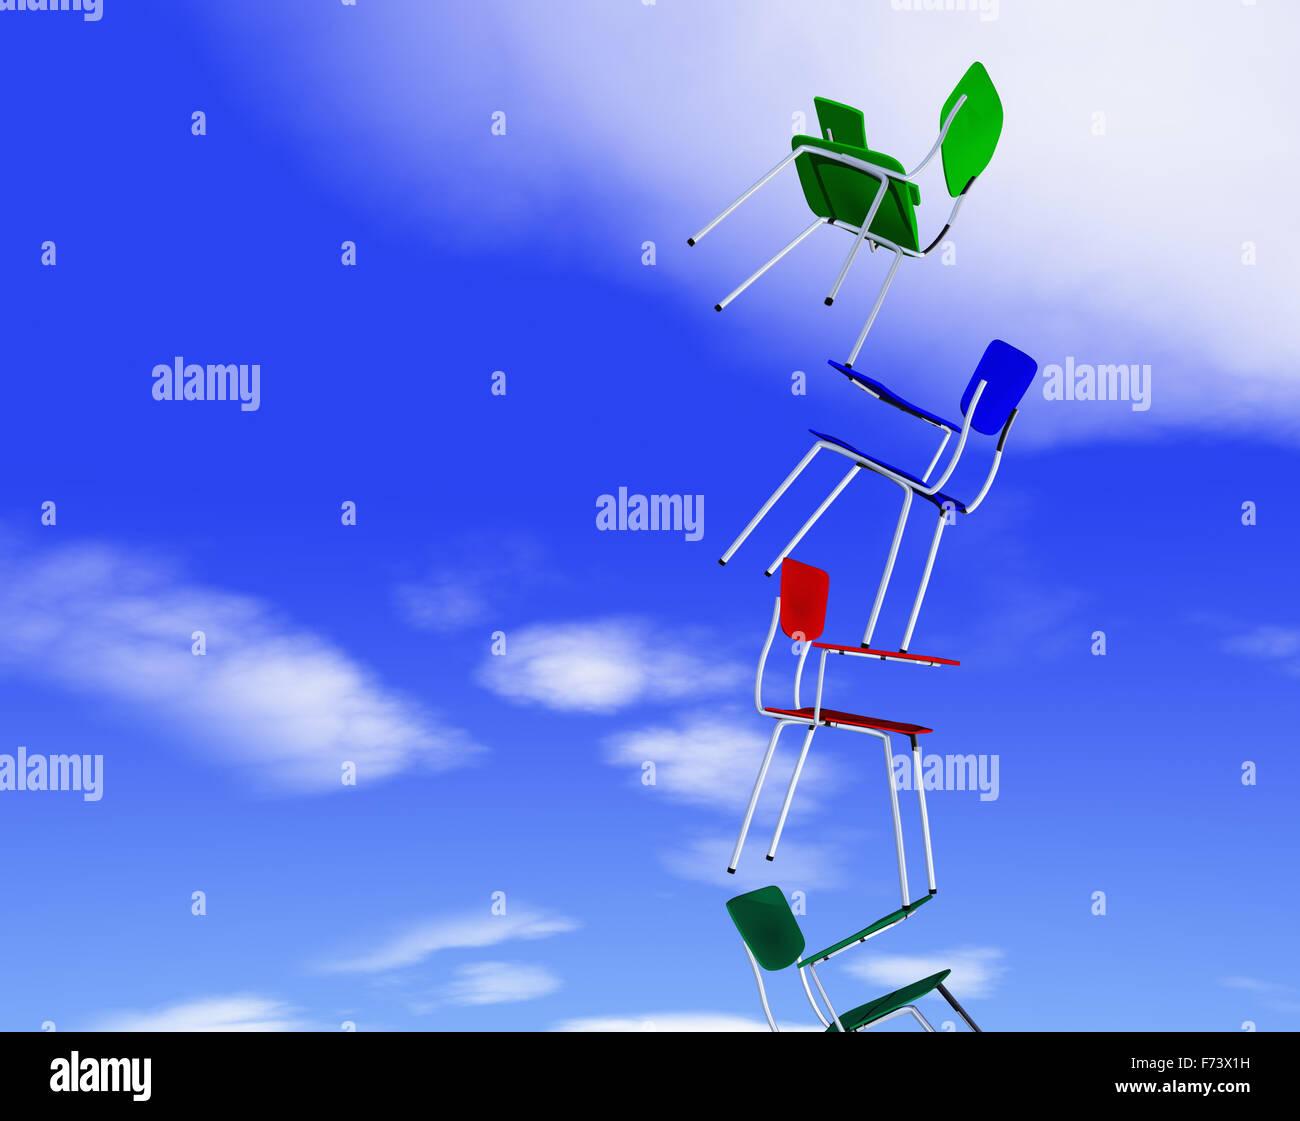 Concepto de equilibrio Imagen De Stock